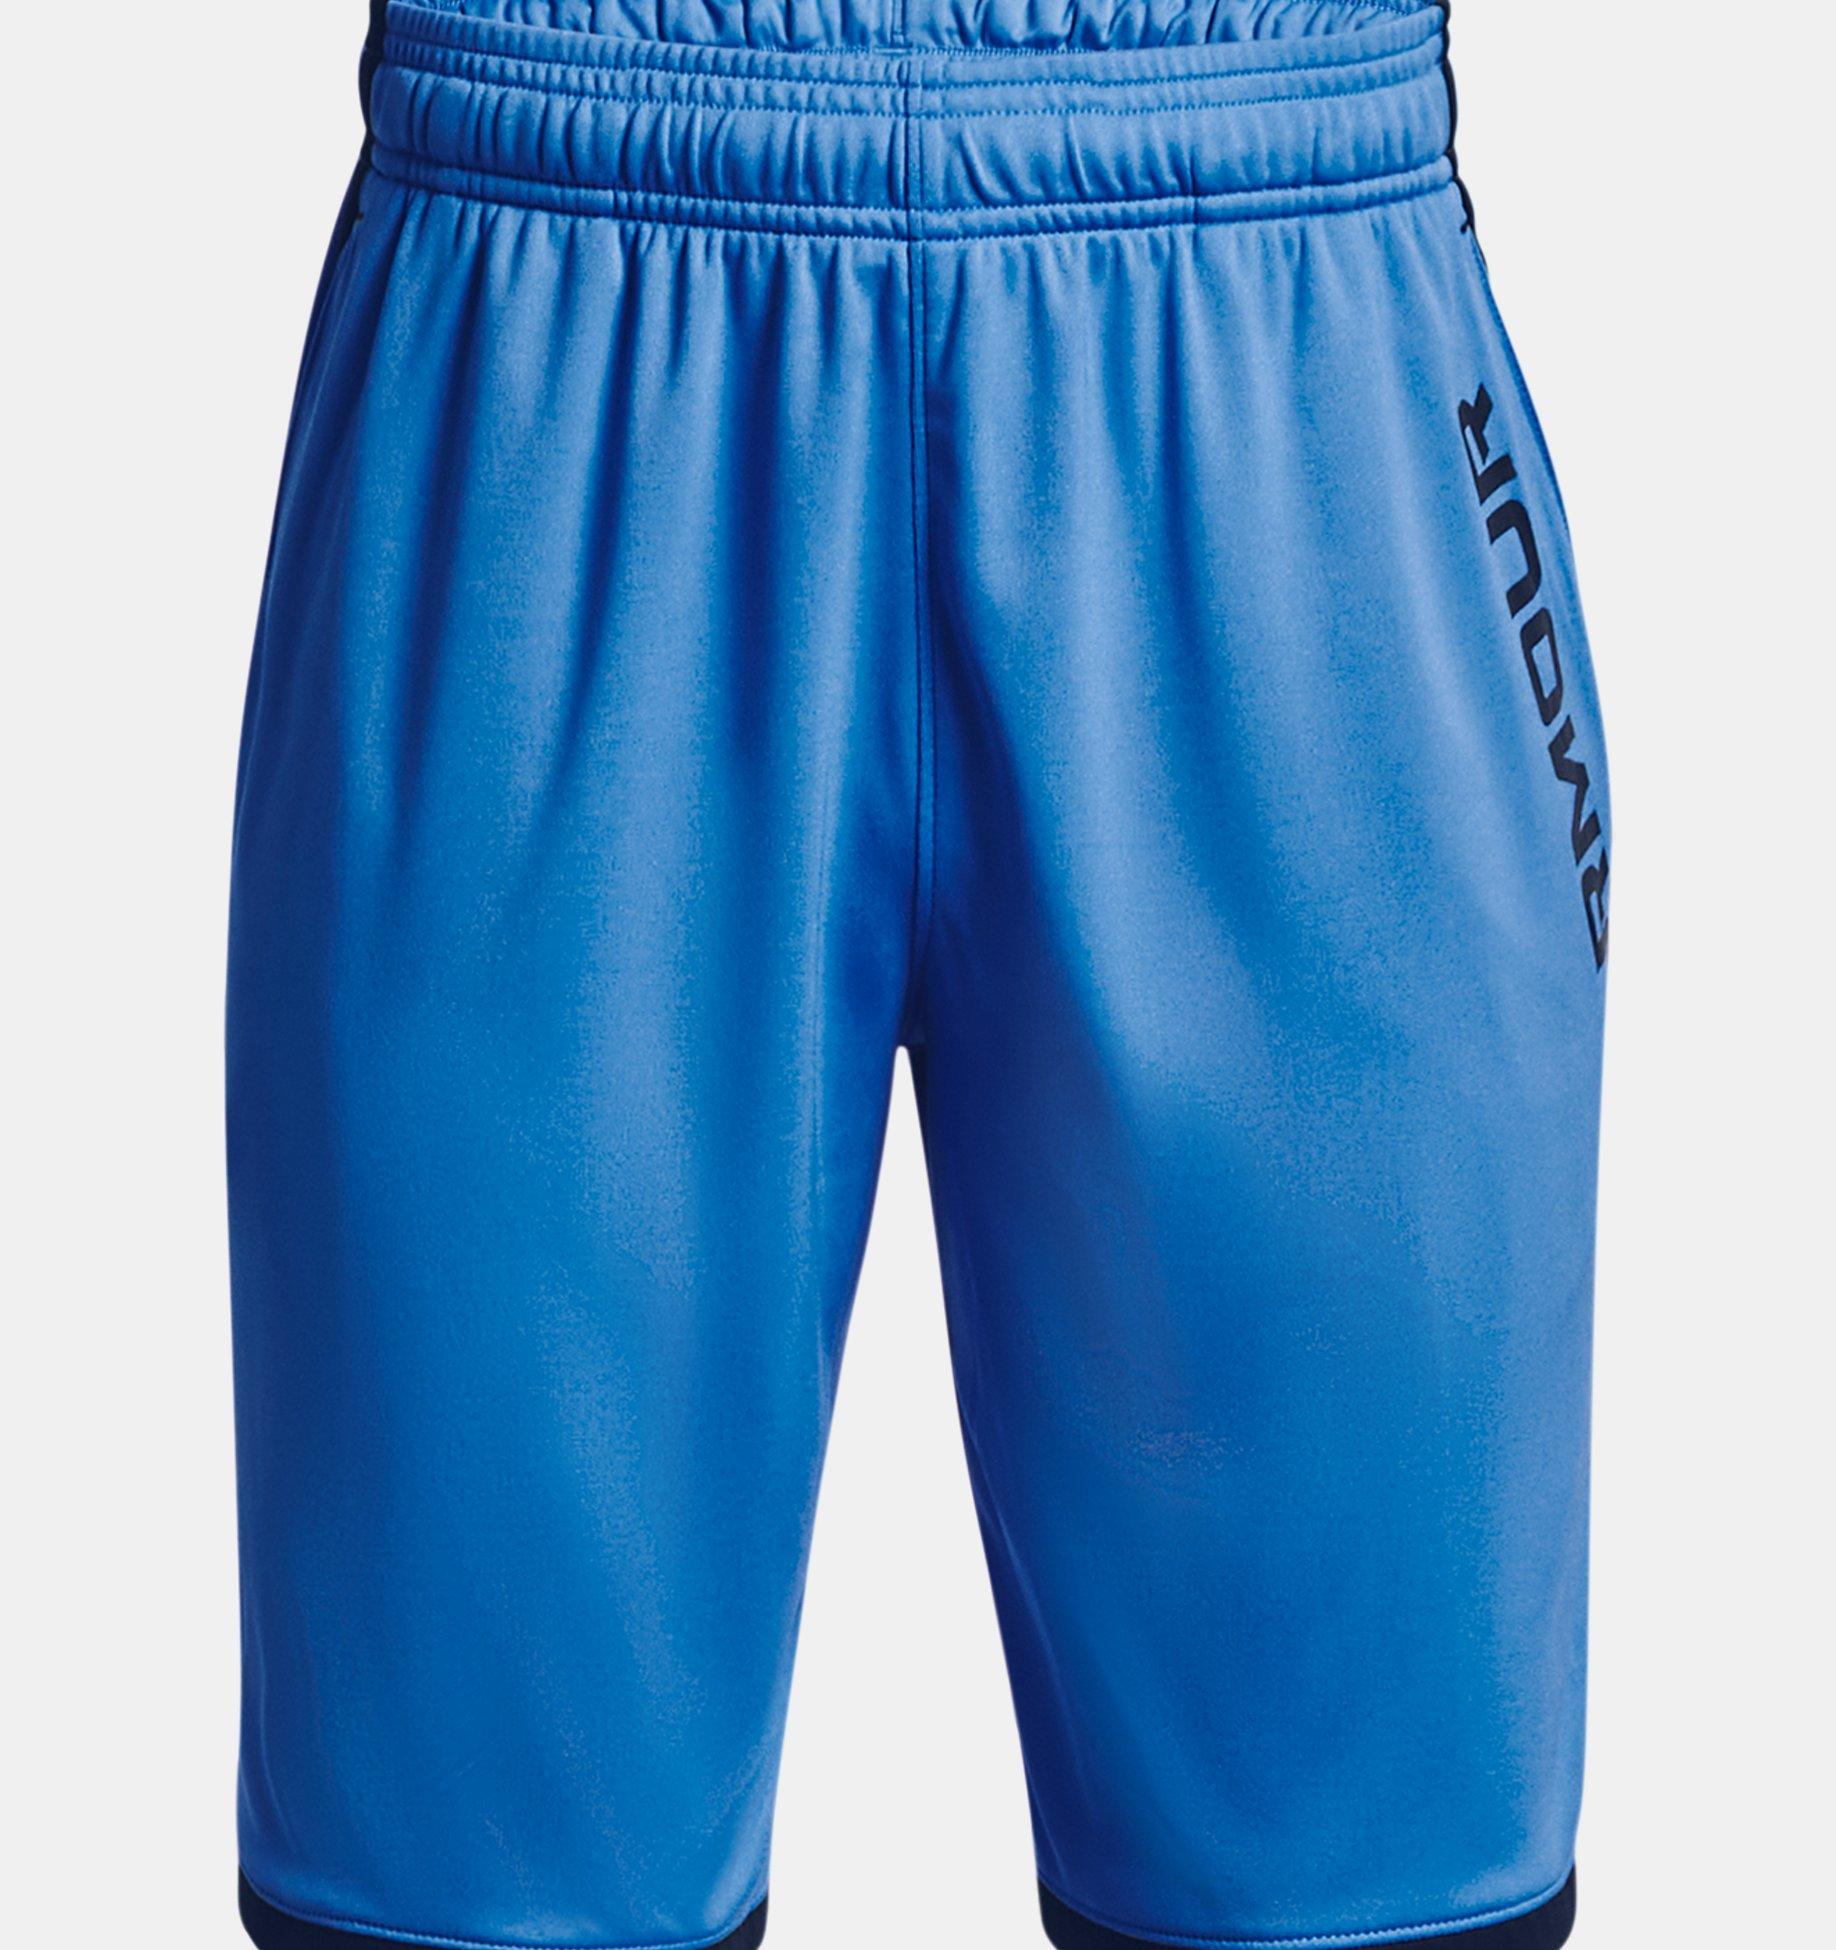 Underarmour Boys UA Stunt 3.0 Printed Shorts